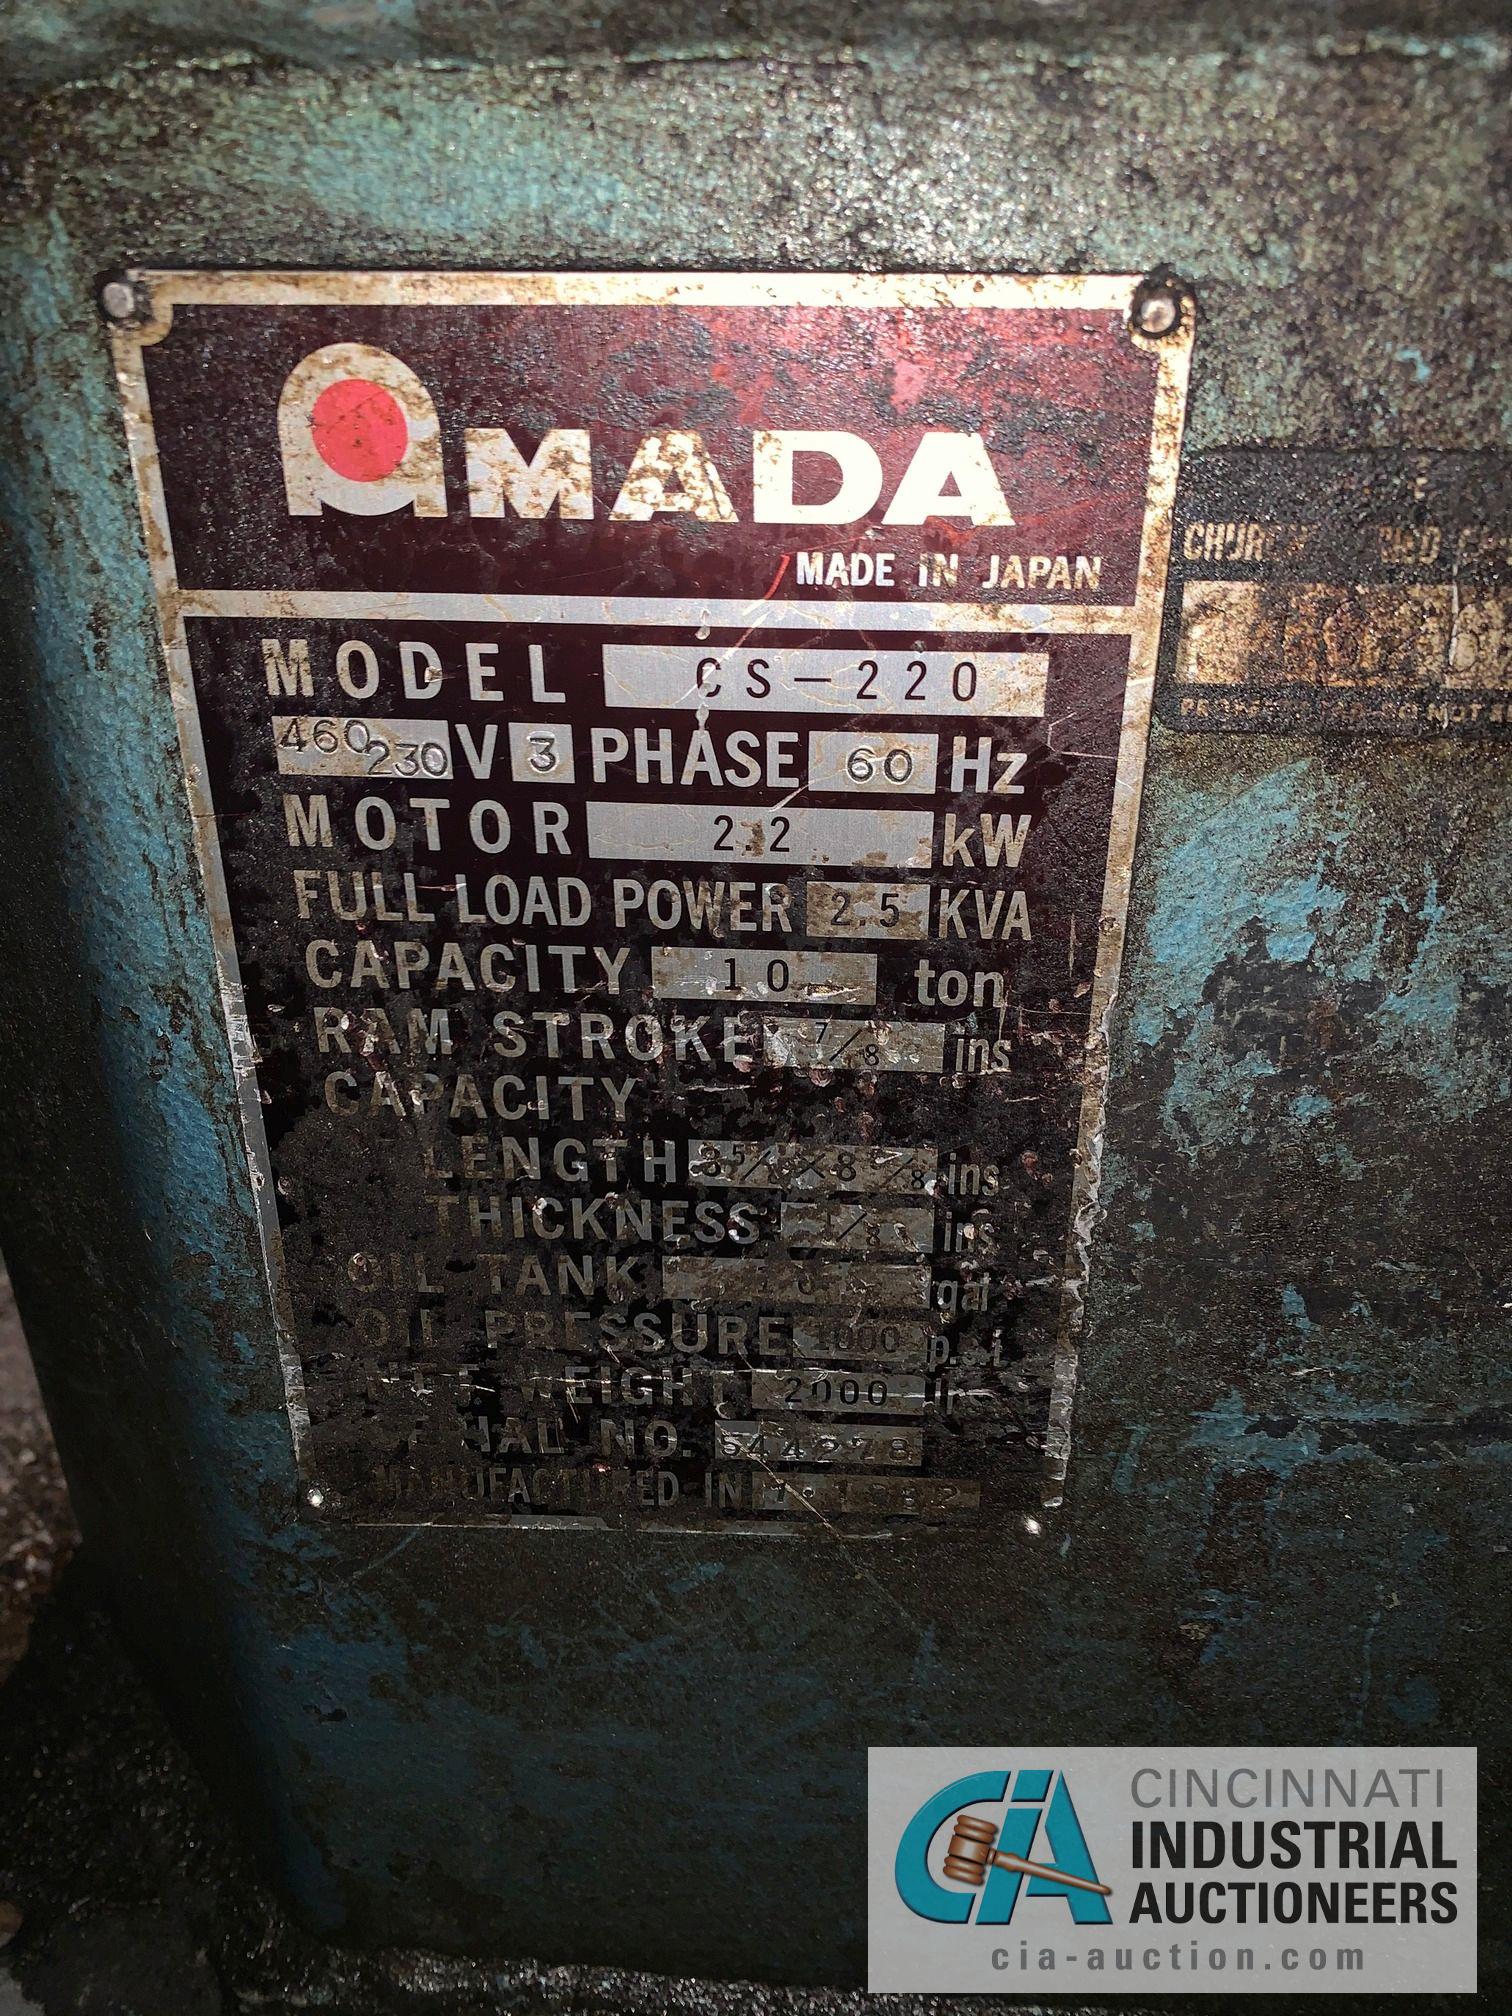 "9"" X 9"" AMADA CS-220 HYDRAULIC NOTCHER; S/N S44278, 7/8"" STROKE, 10 TON, 1/8"" THICK - Image 9 of 9"